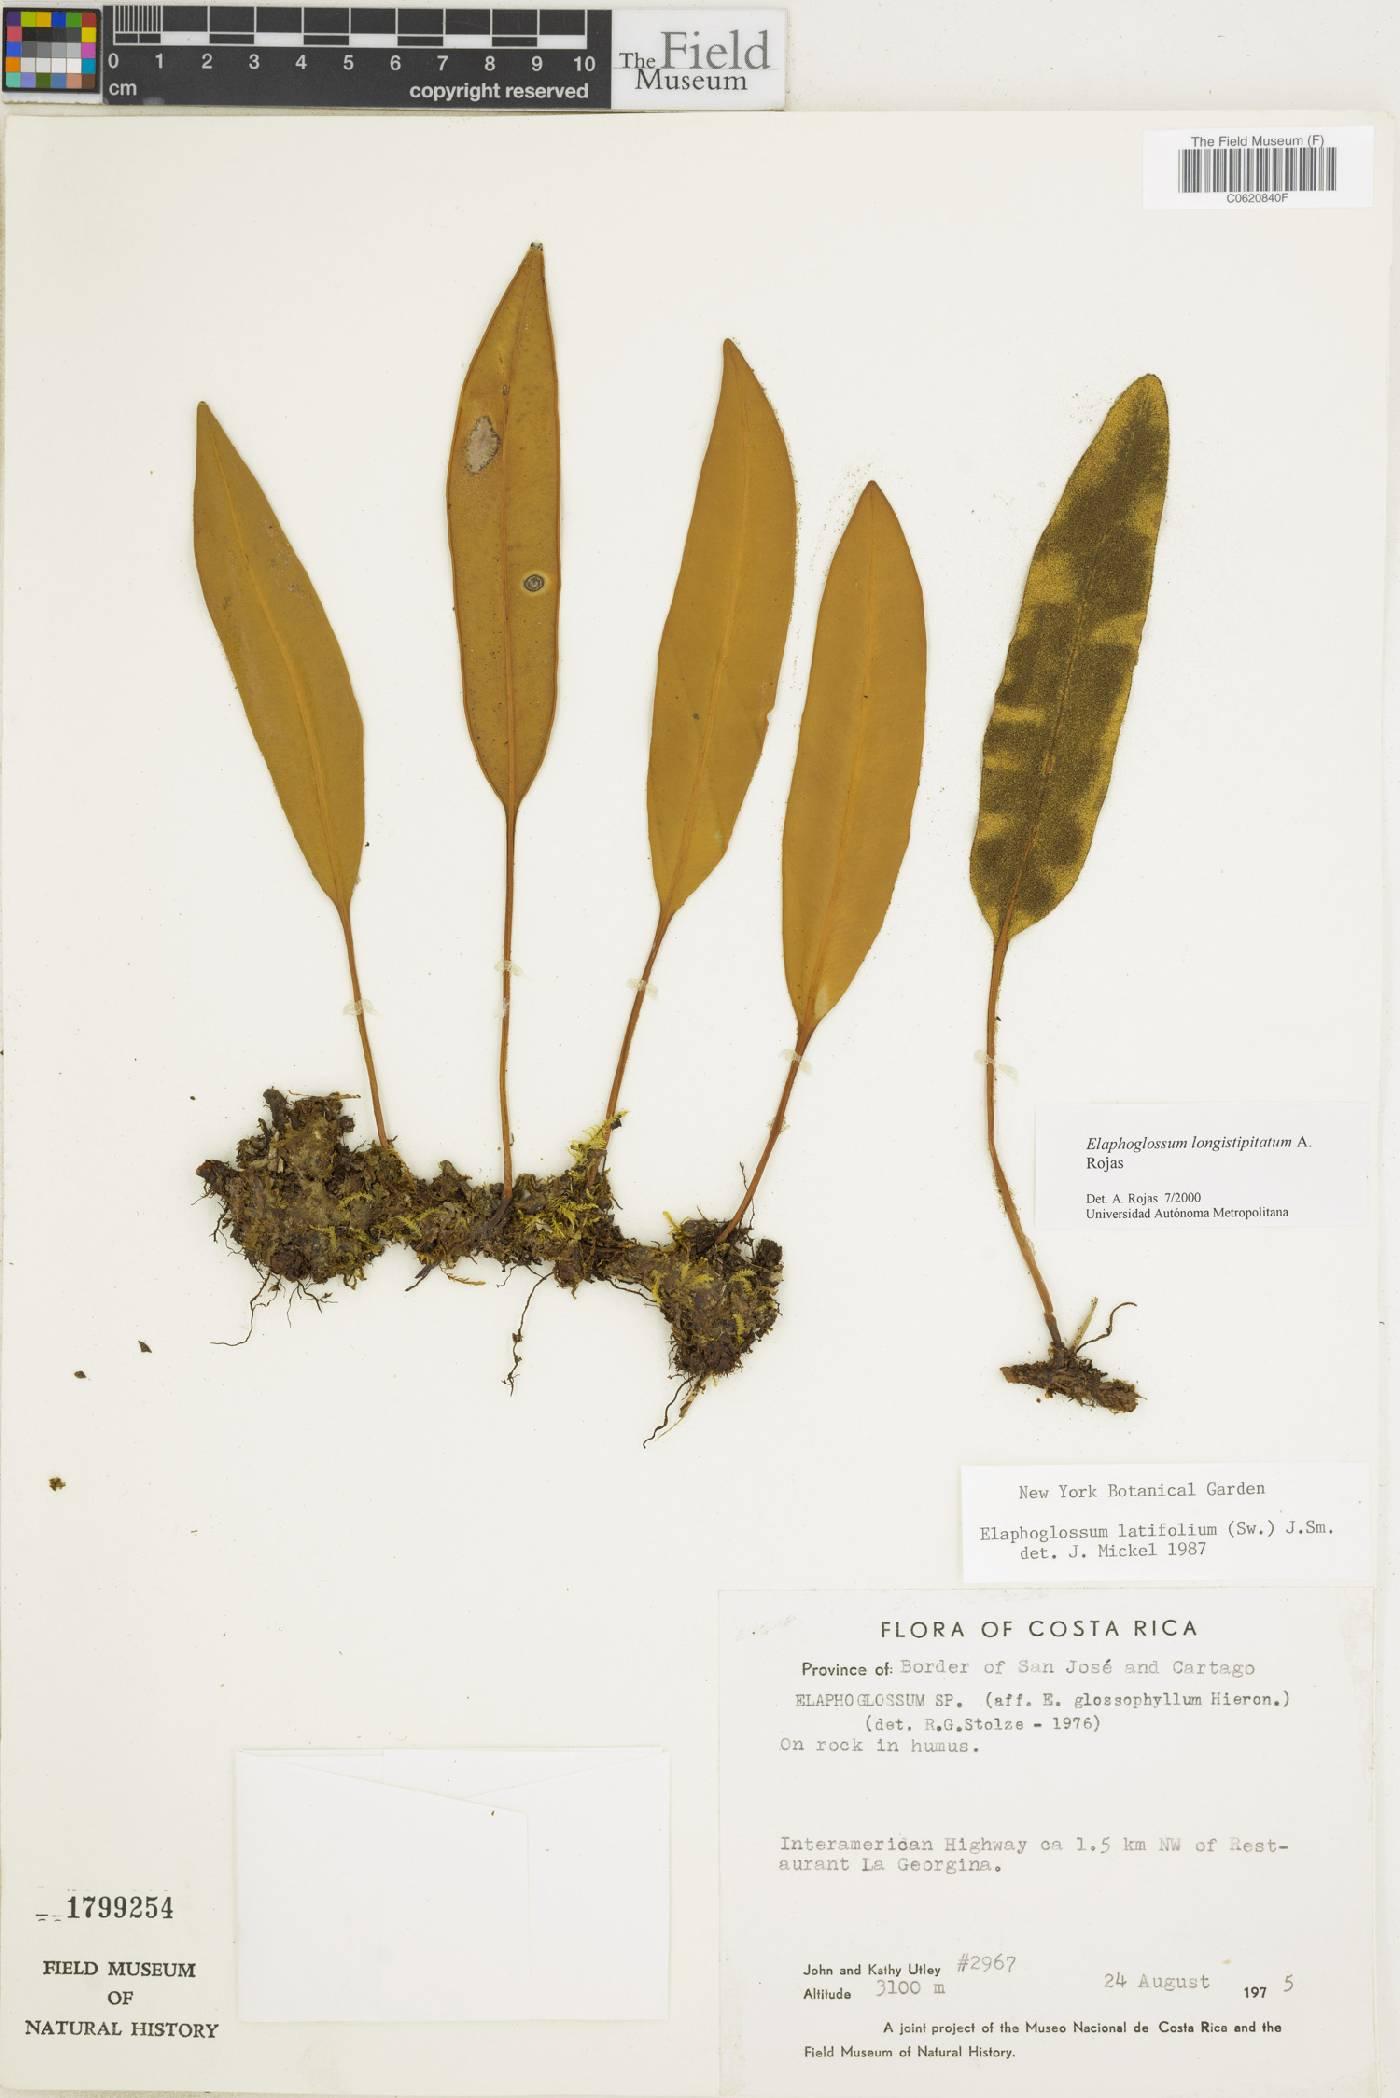 Elaphoglossum longistipitatum image